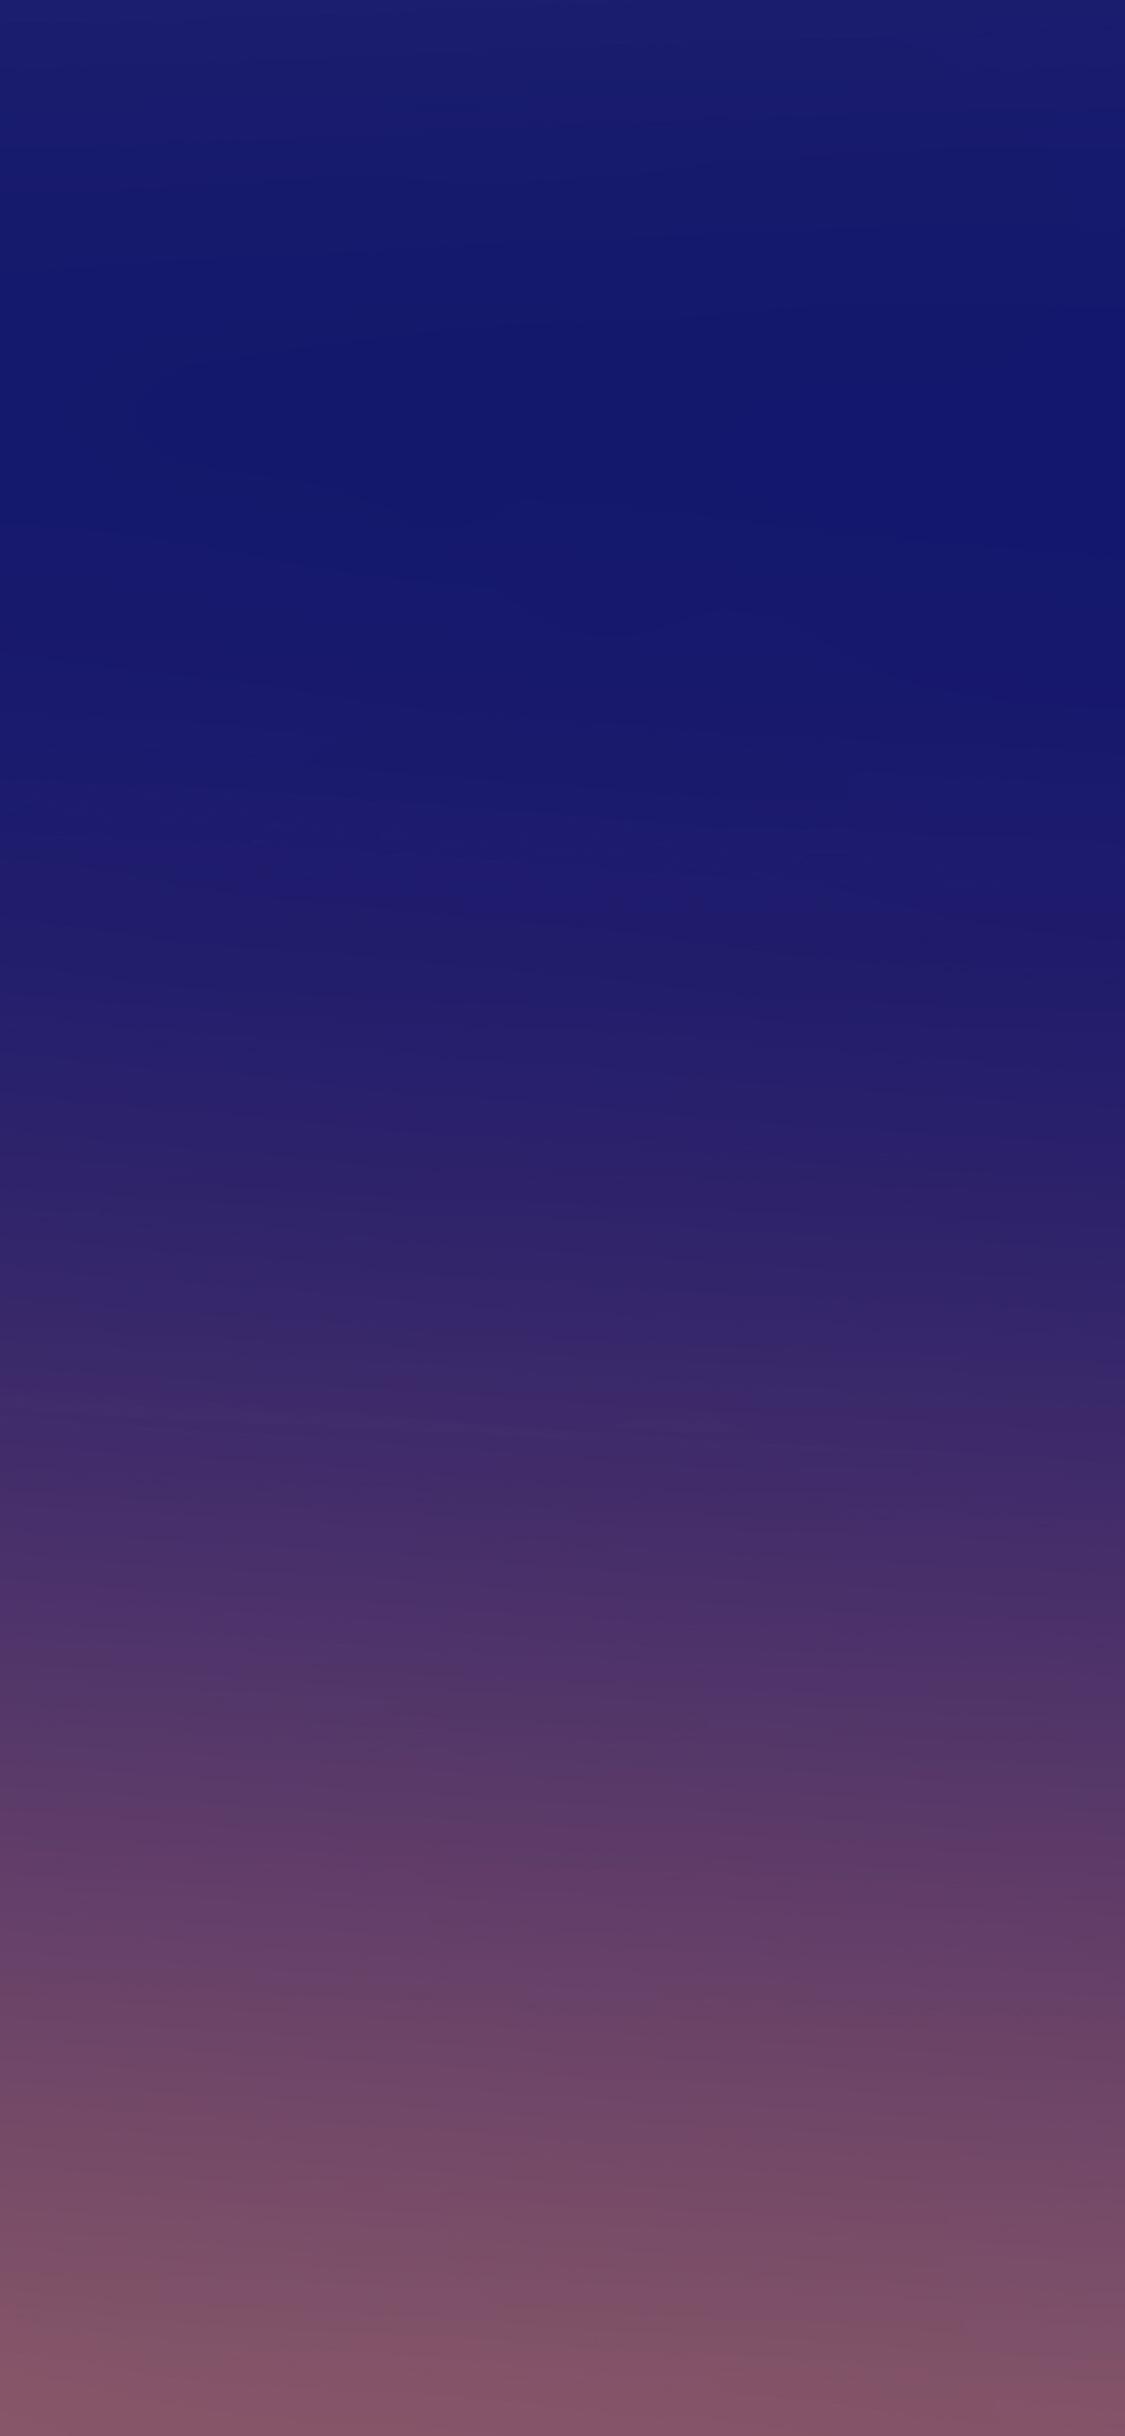 iPhoneXpapers.com-Apple-iPhone-wallpaper-sc78-tasty-road-night-blur